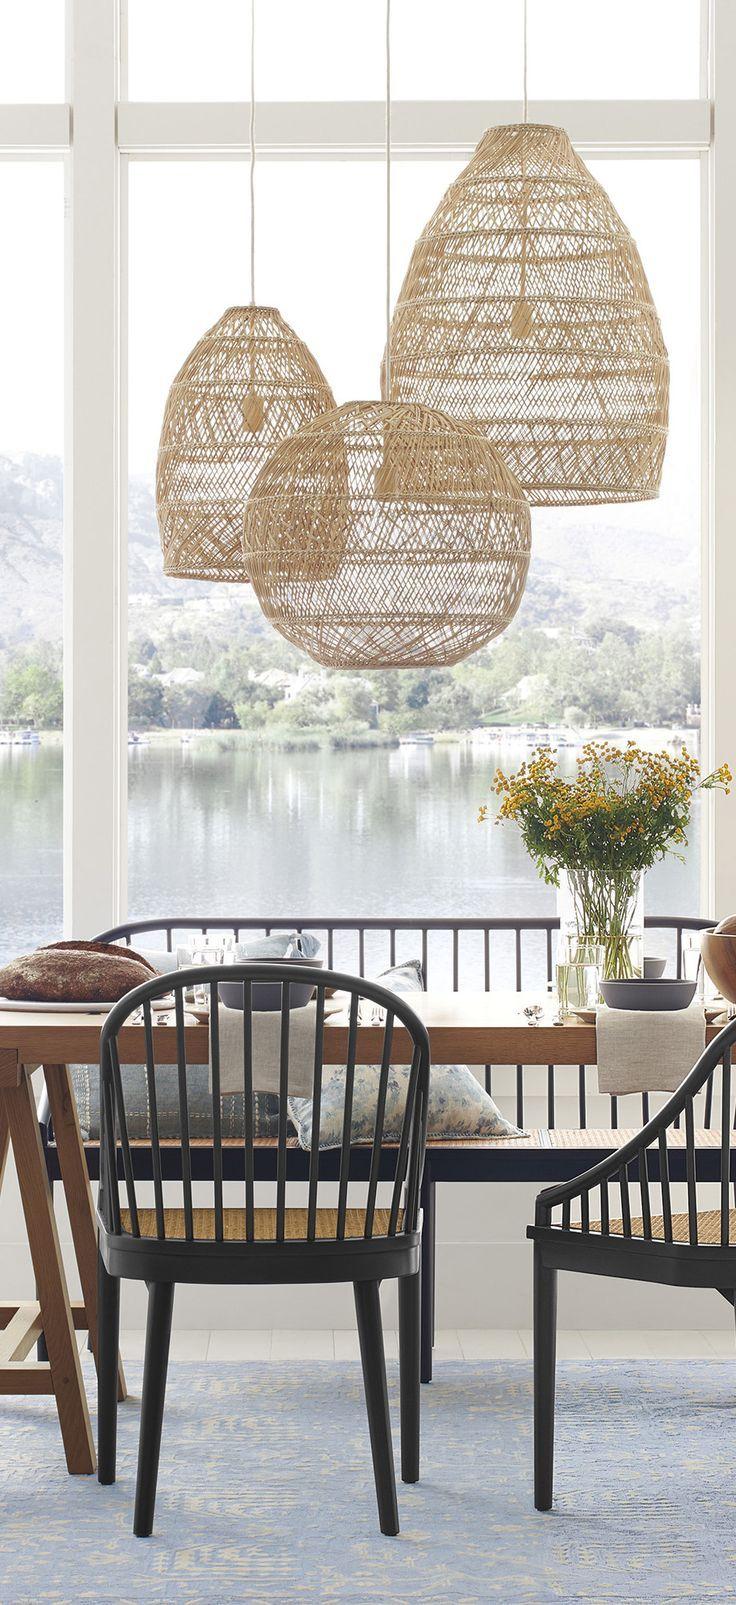 Large Rattan Pendant Lights Scandinavian Design In 2020 Scandinavian Design Living Room Pendant Lighting Dining Room Scandinavian Dining Room